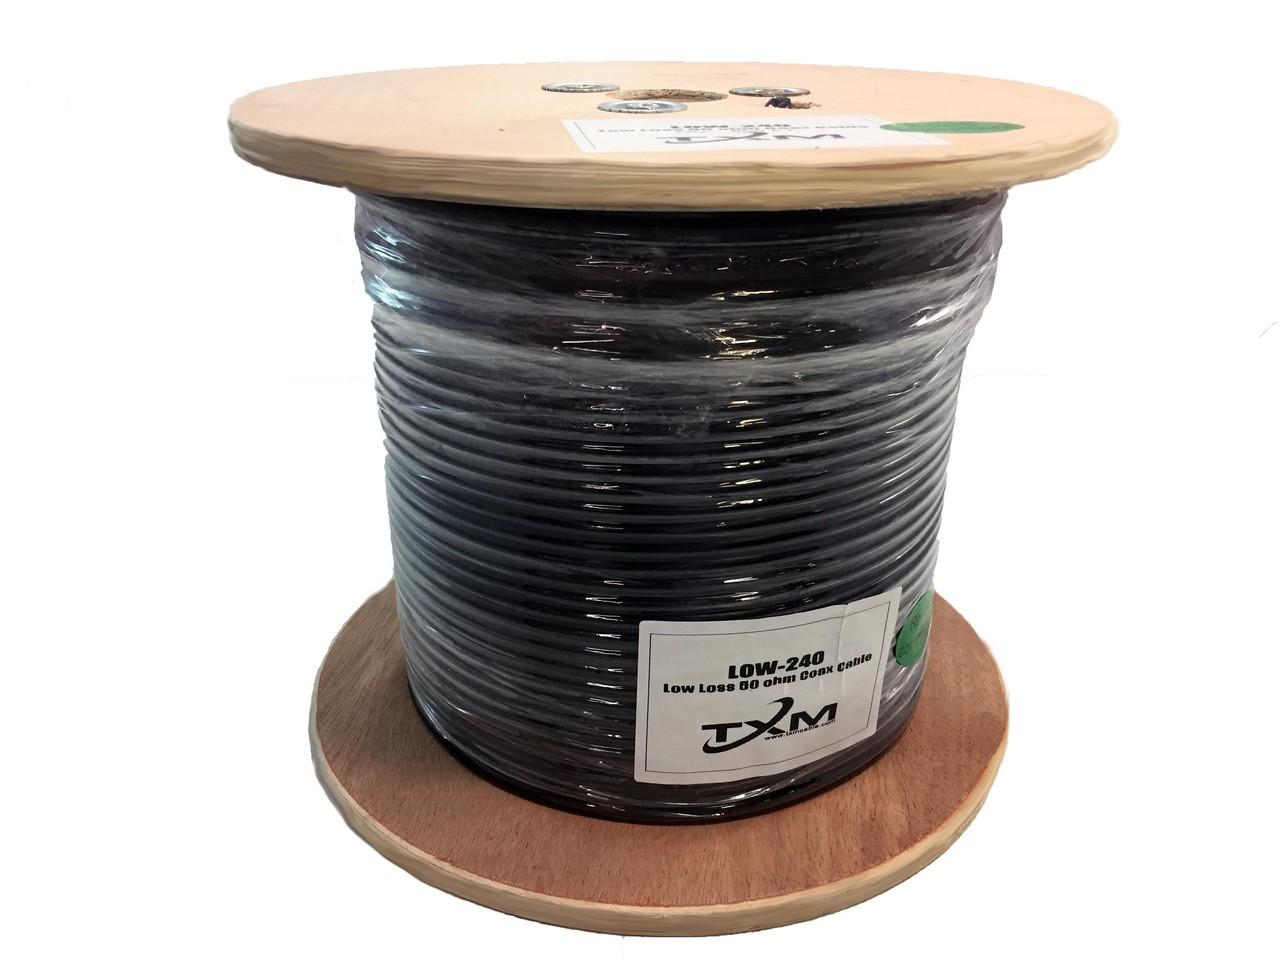 LMR-240 Type Low Loss Coax Cable 1000\' Reel - LOW240M - TXM ...